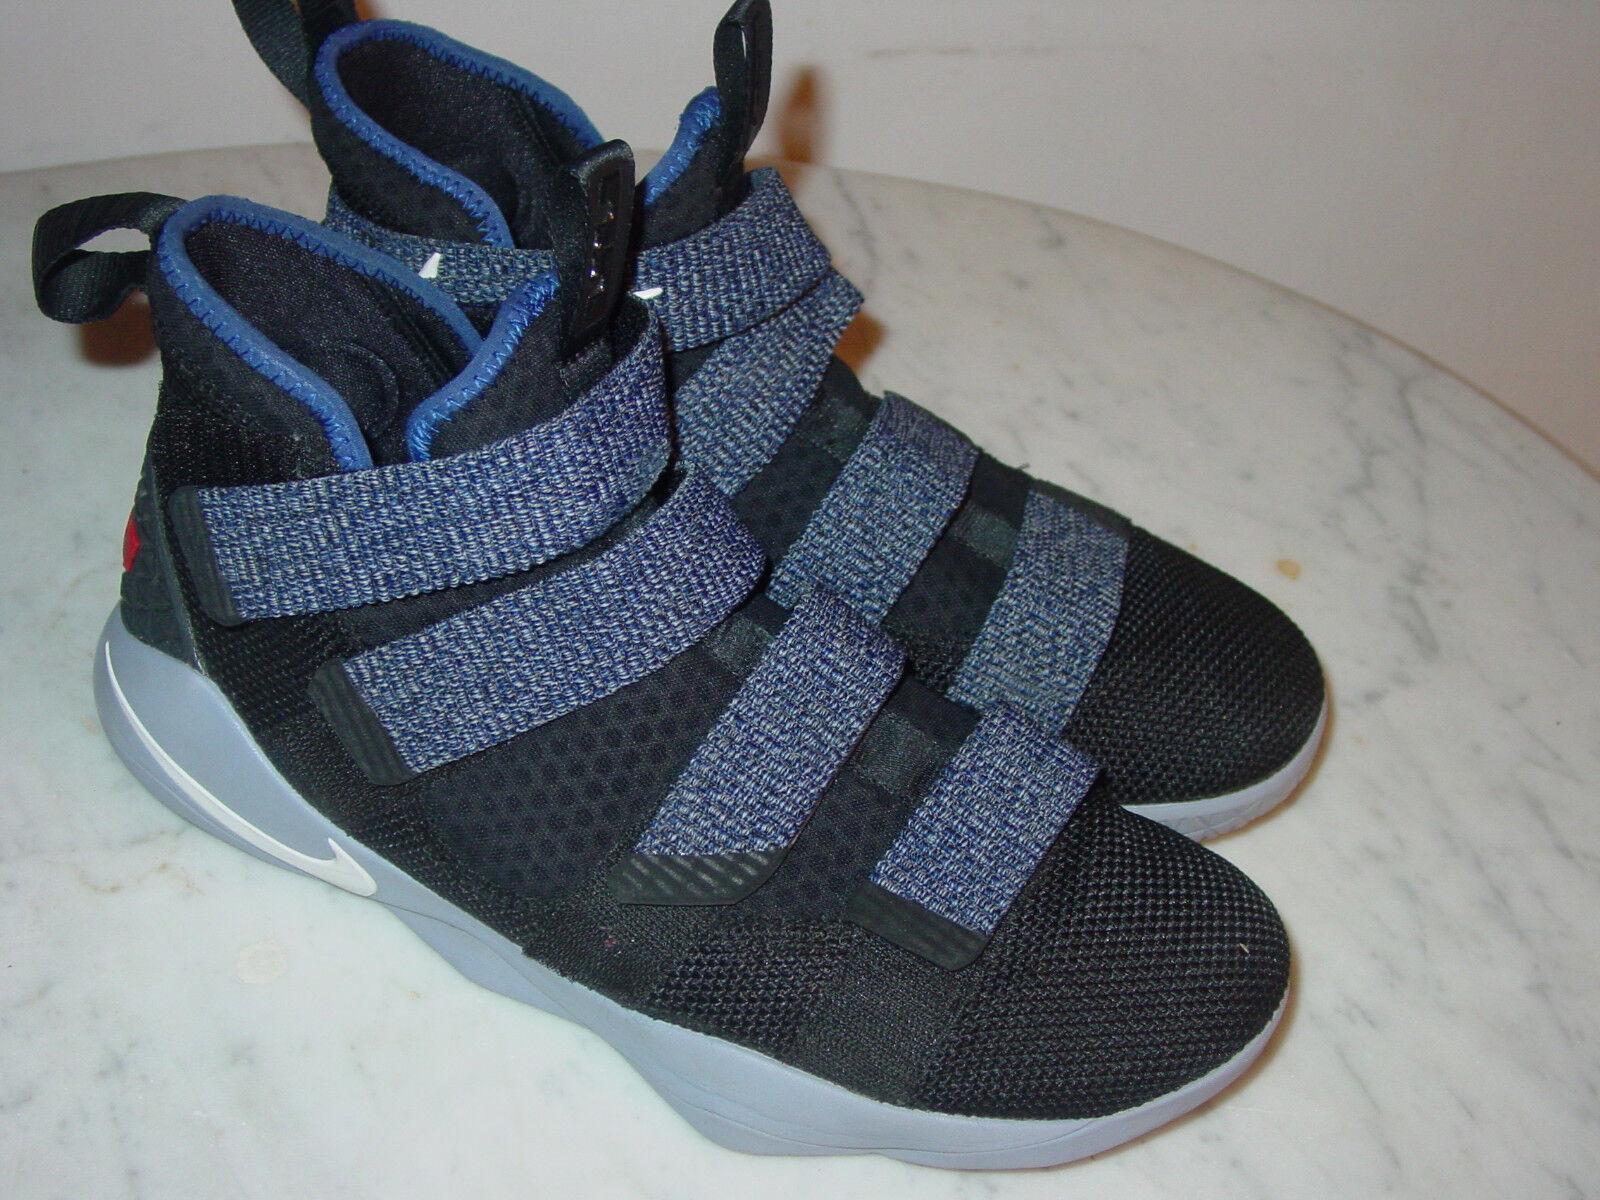 Adidas galaxy 4 m Mens Running Shoes GreyRed B75575 Size 9.5 12 Boost